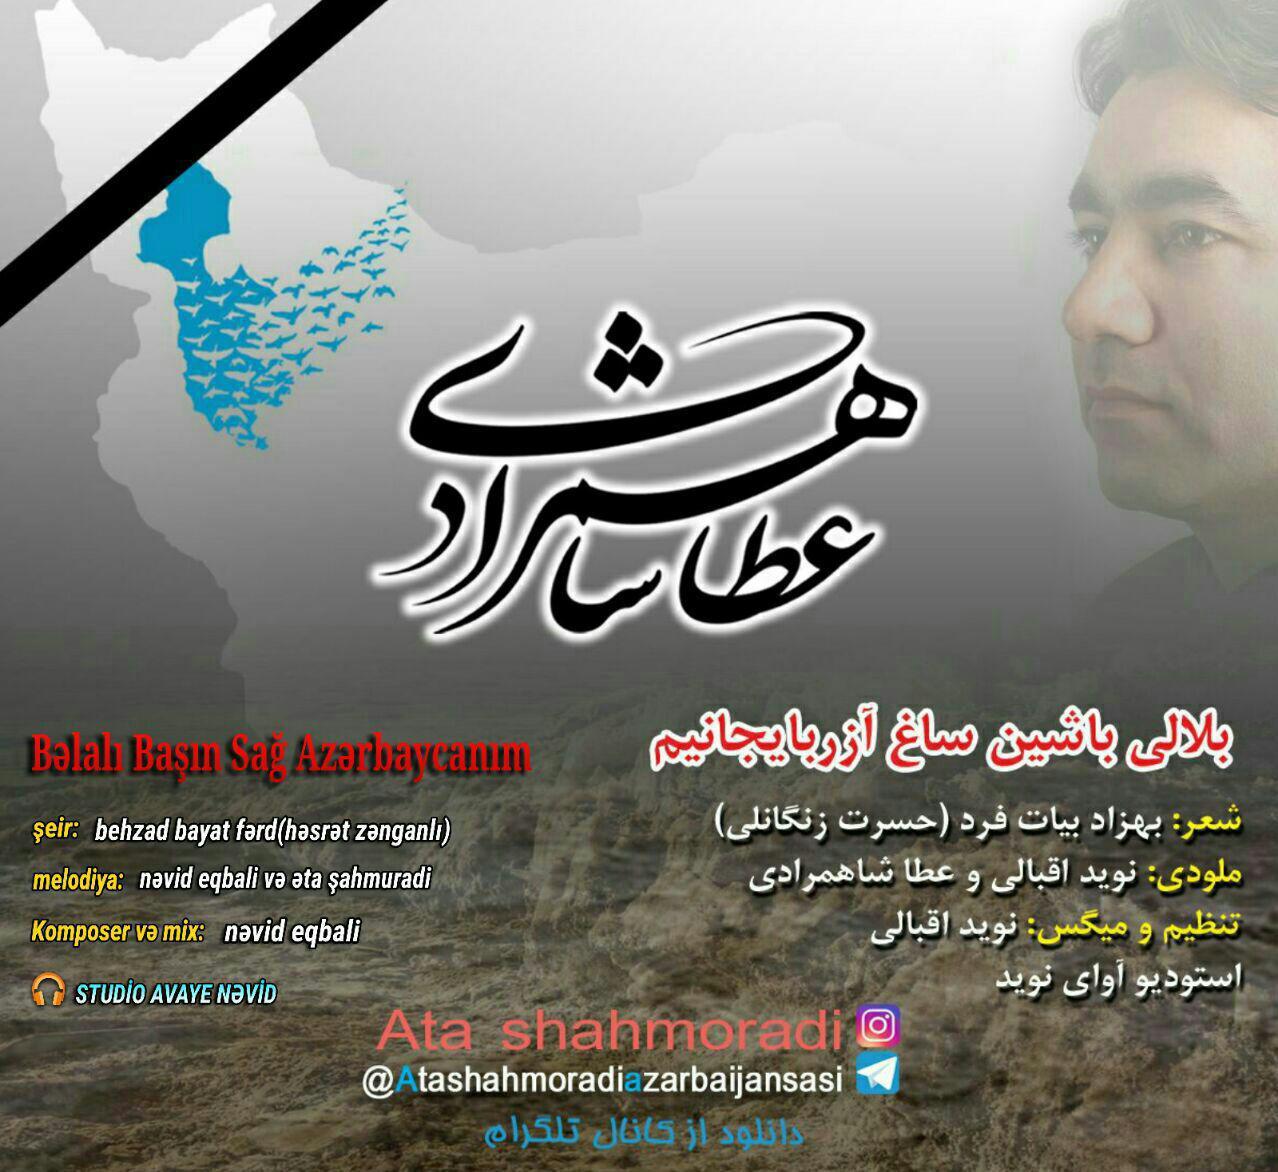 http://s9.picofile.com/file/8292537750/1Ata_Sahmoradi_Belali_Basin_Sag_Azerbaycanim.jpg